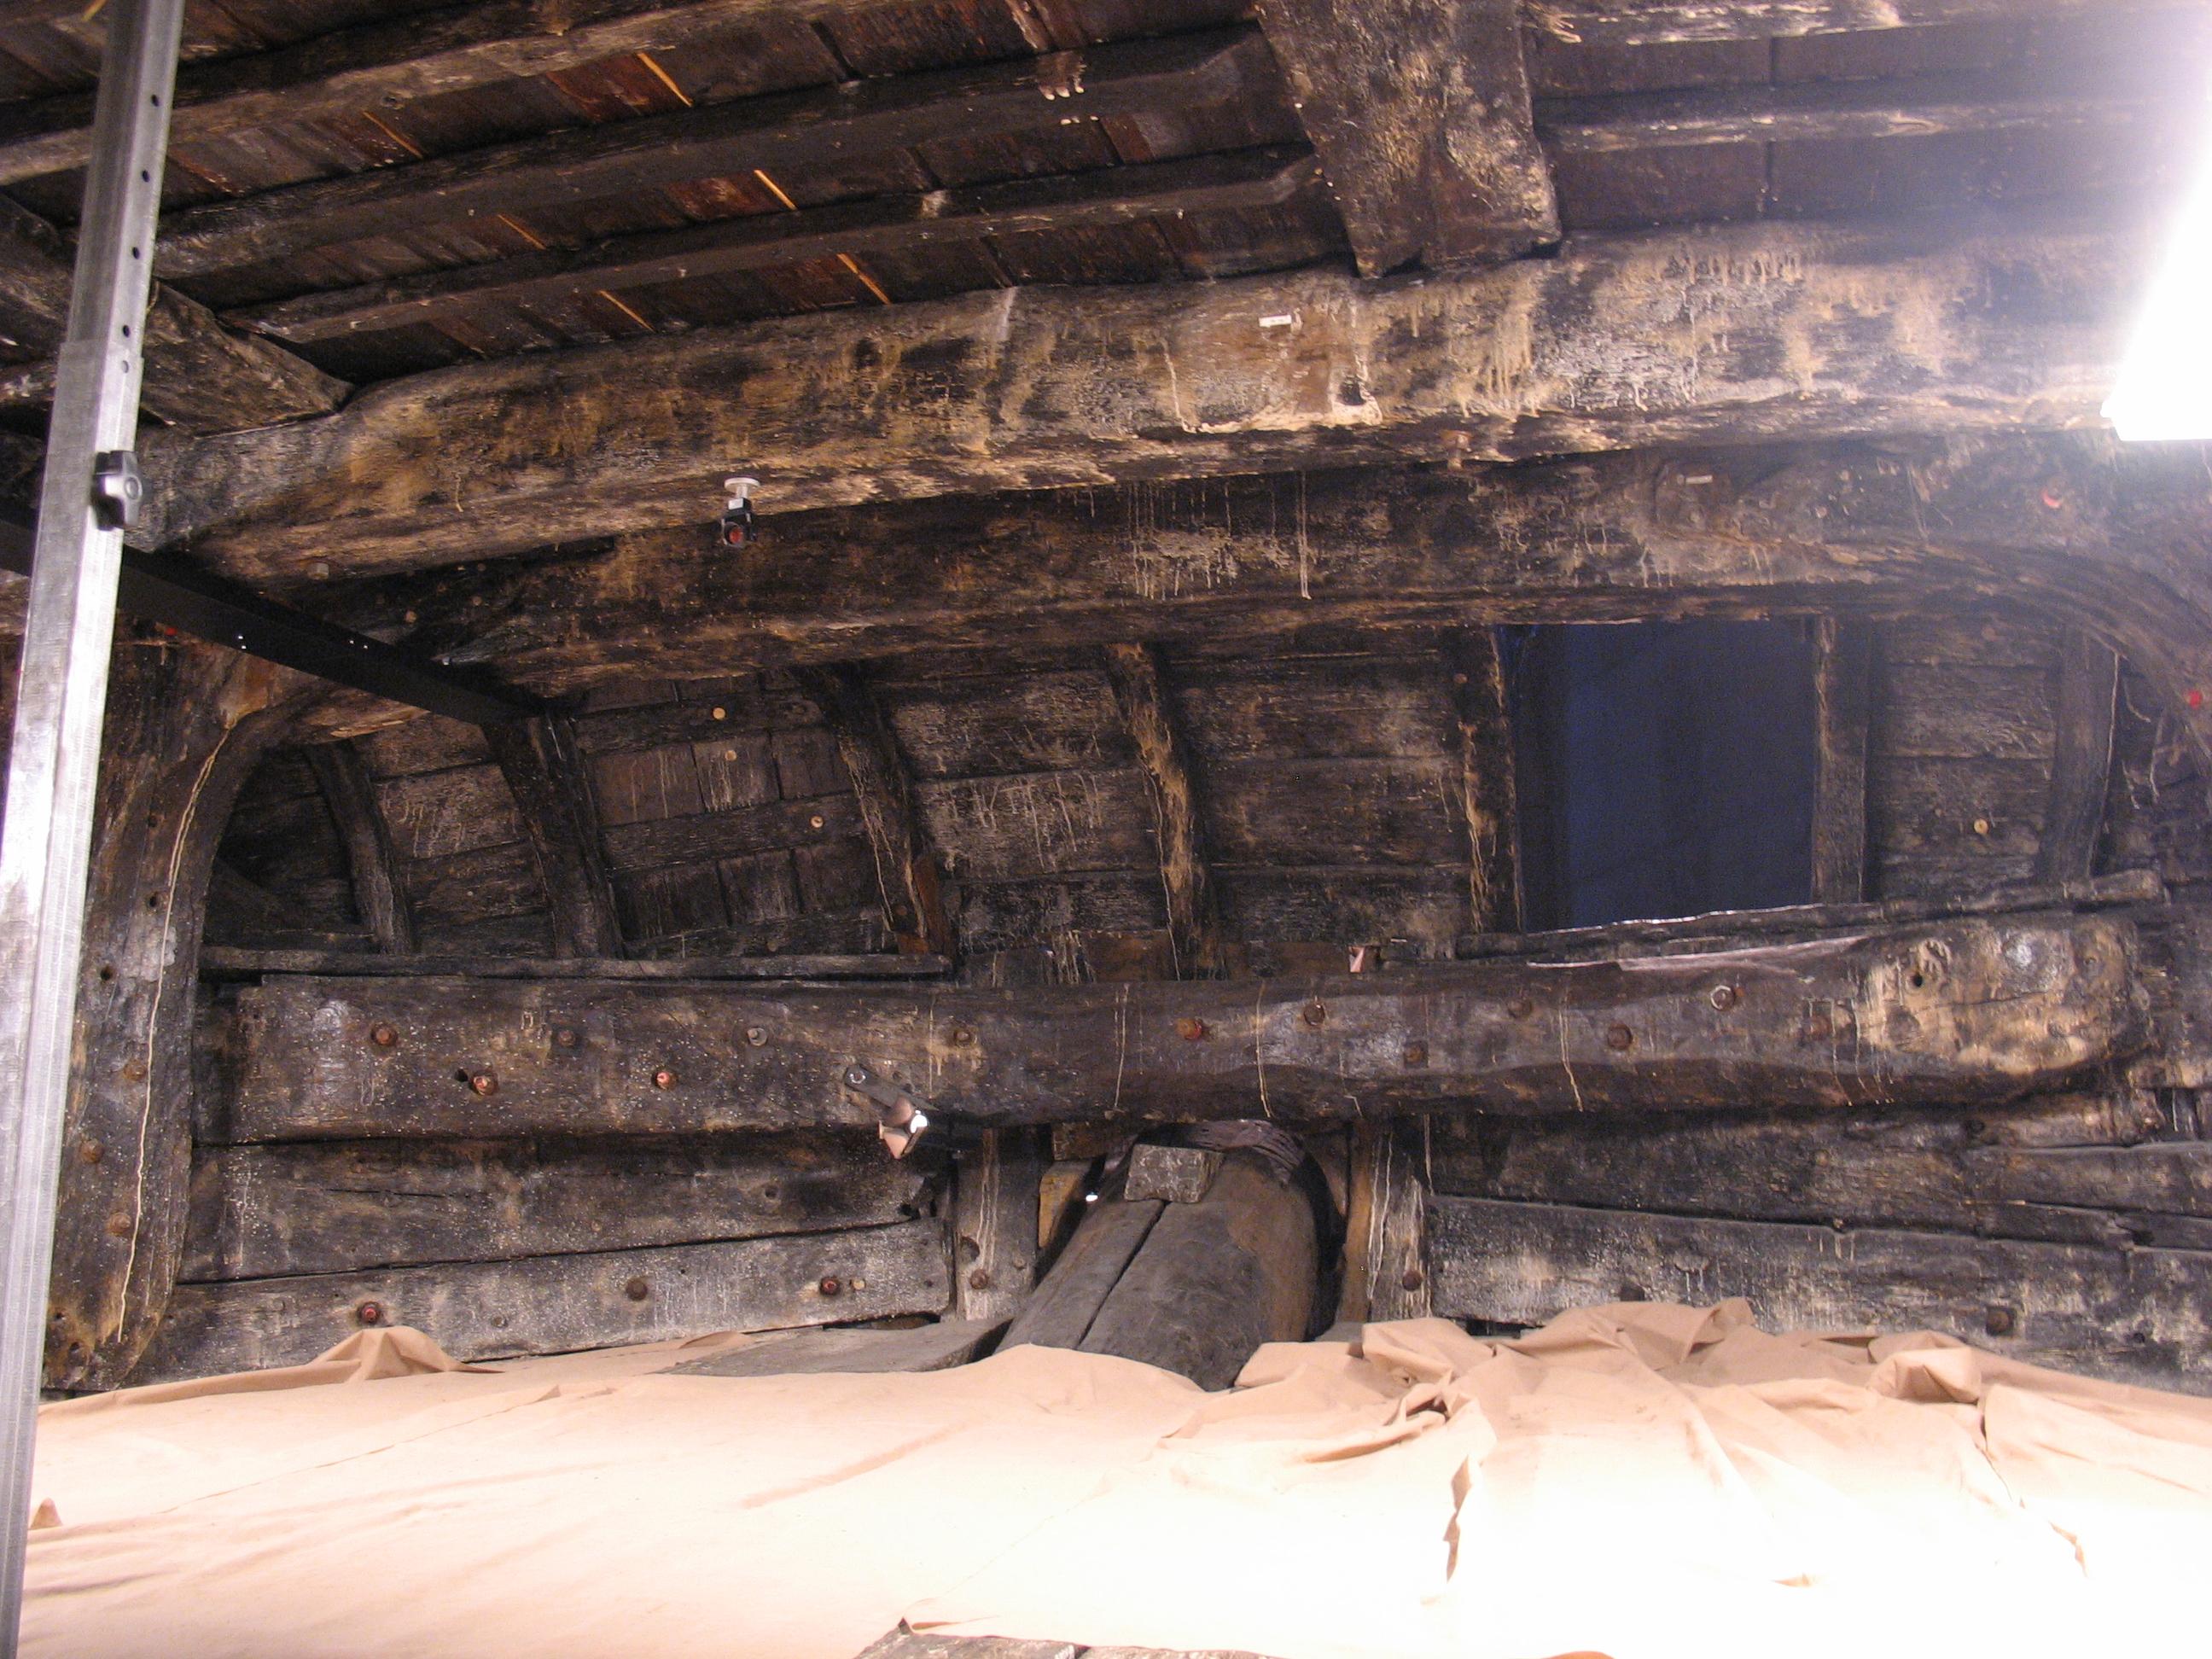 File:Vasa-upper gun deck-7.jpg - Wikimedia Commons